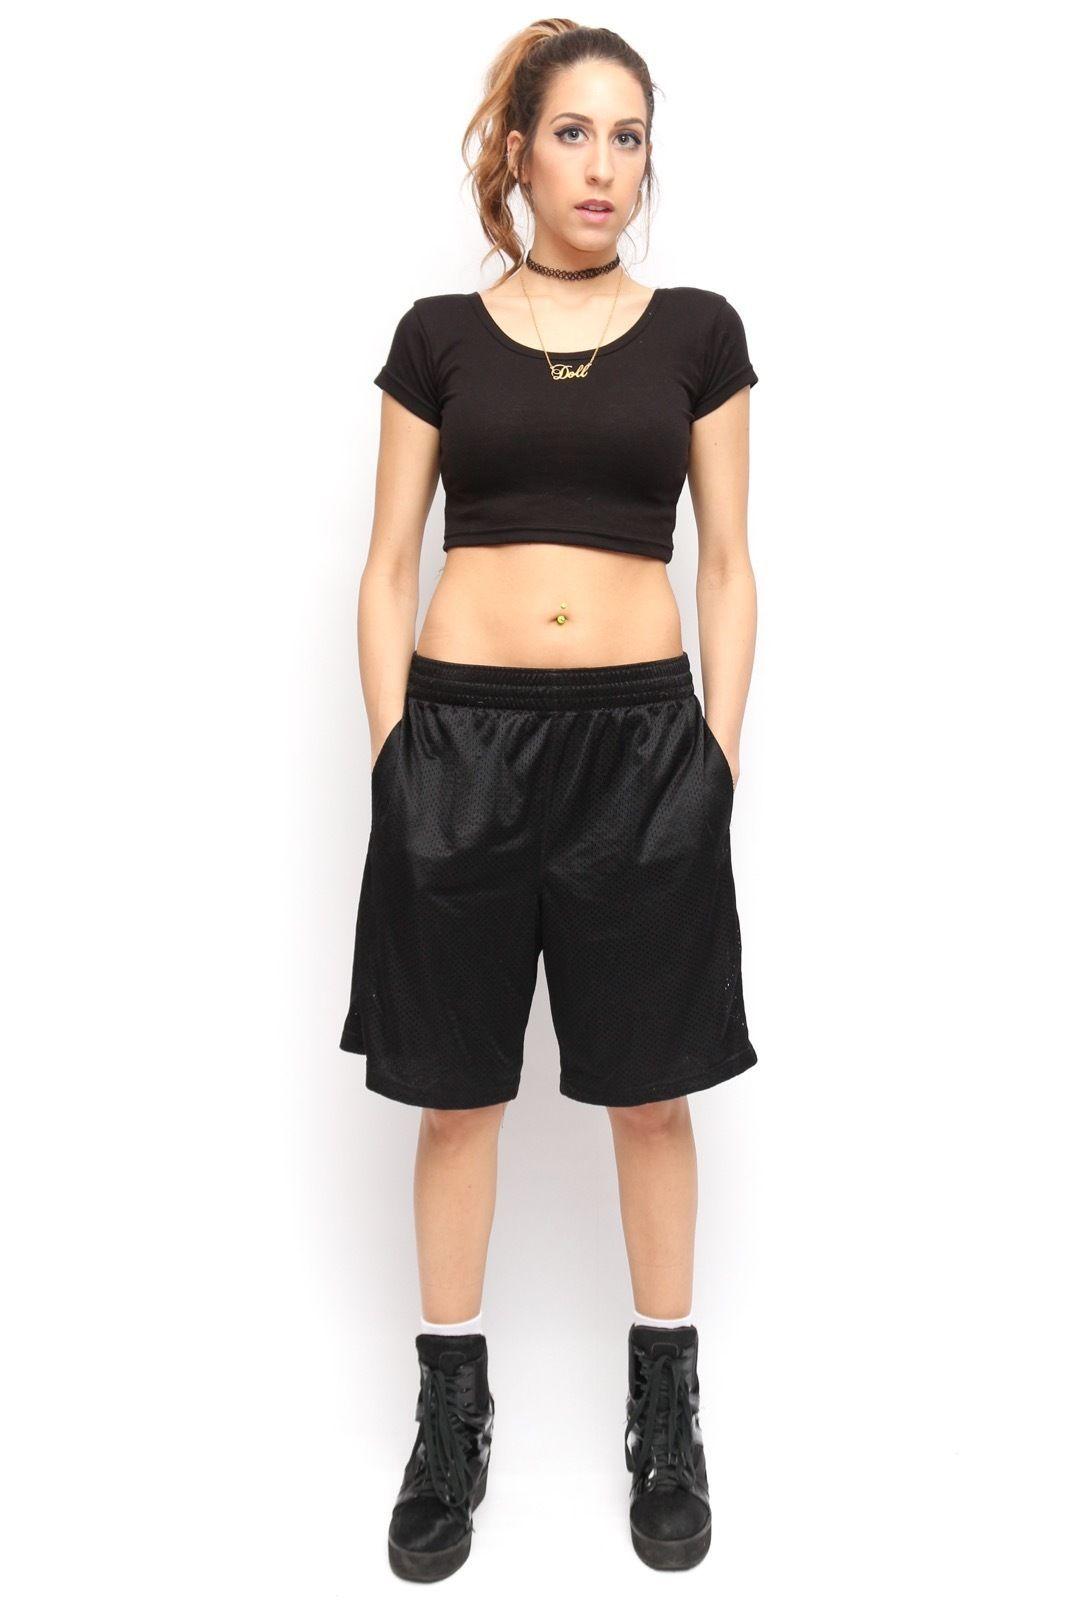 Athletech Black Mesh Vintage 90 S Style Hip Hop Basketball Shorts Basketball Shorts Black Mesh Shorts